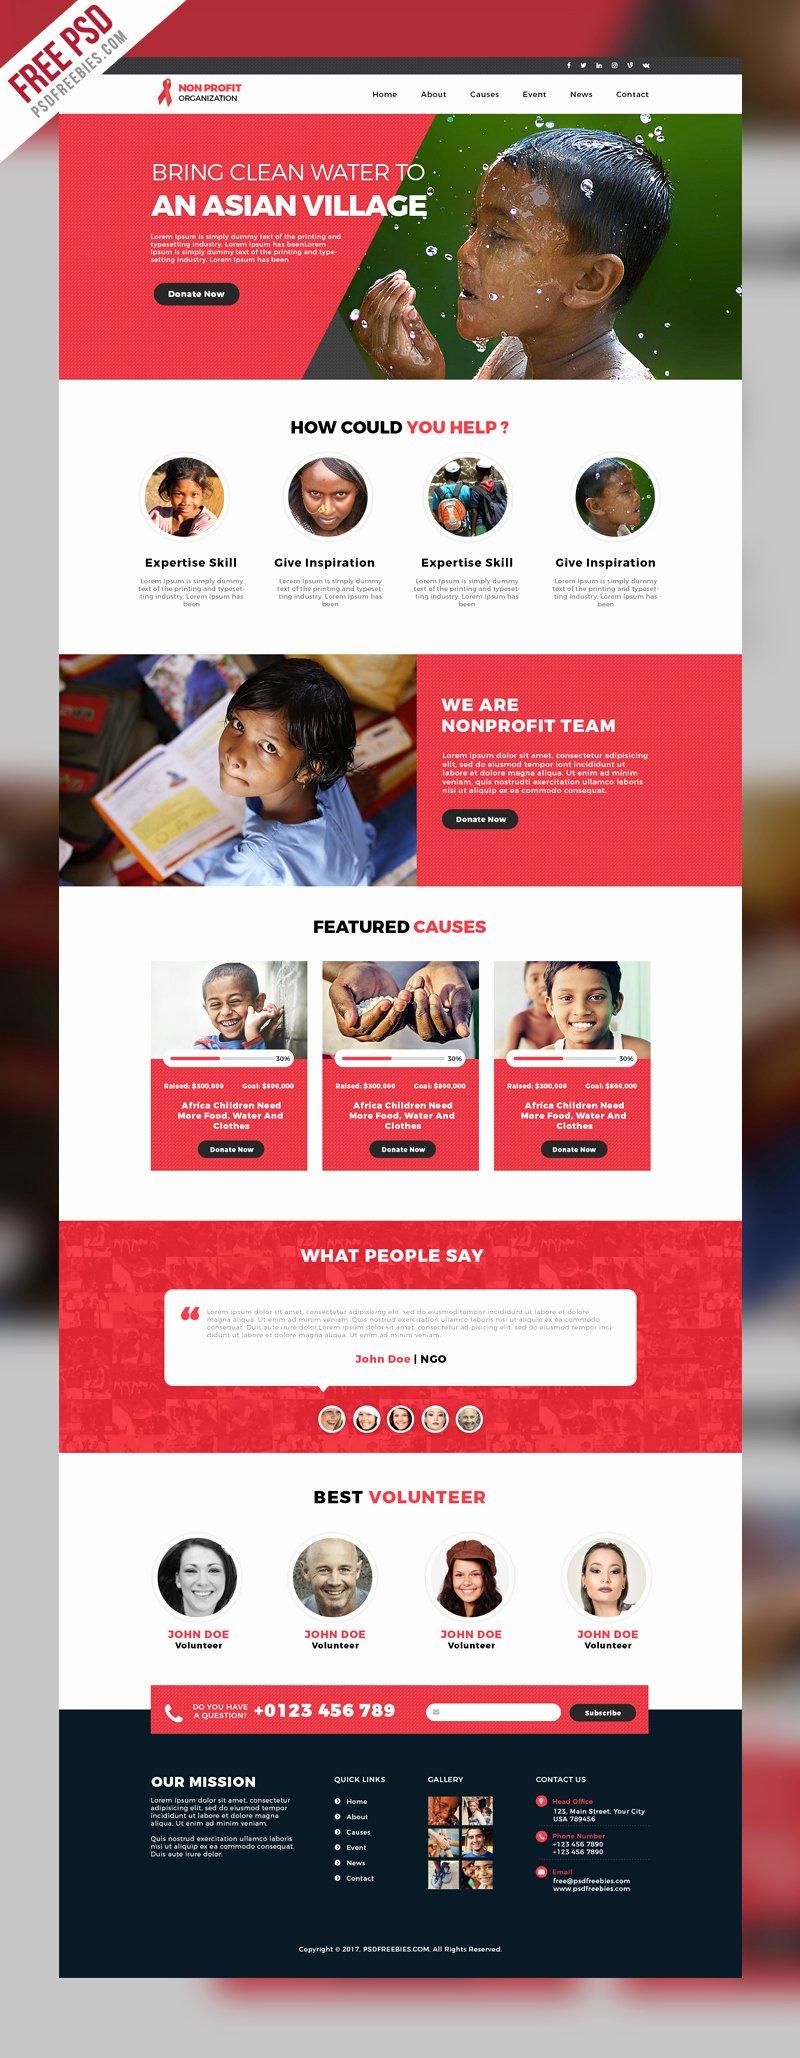 non profit organization website template free psd